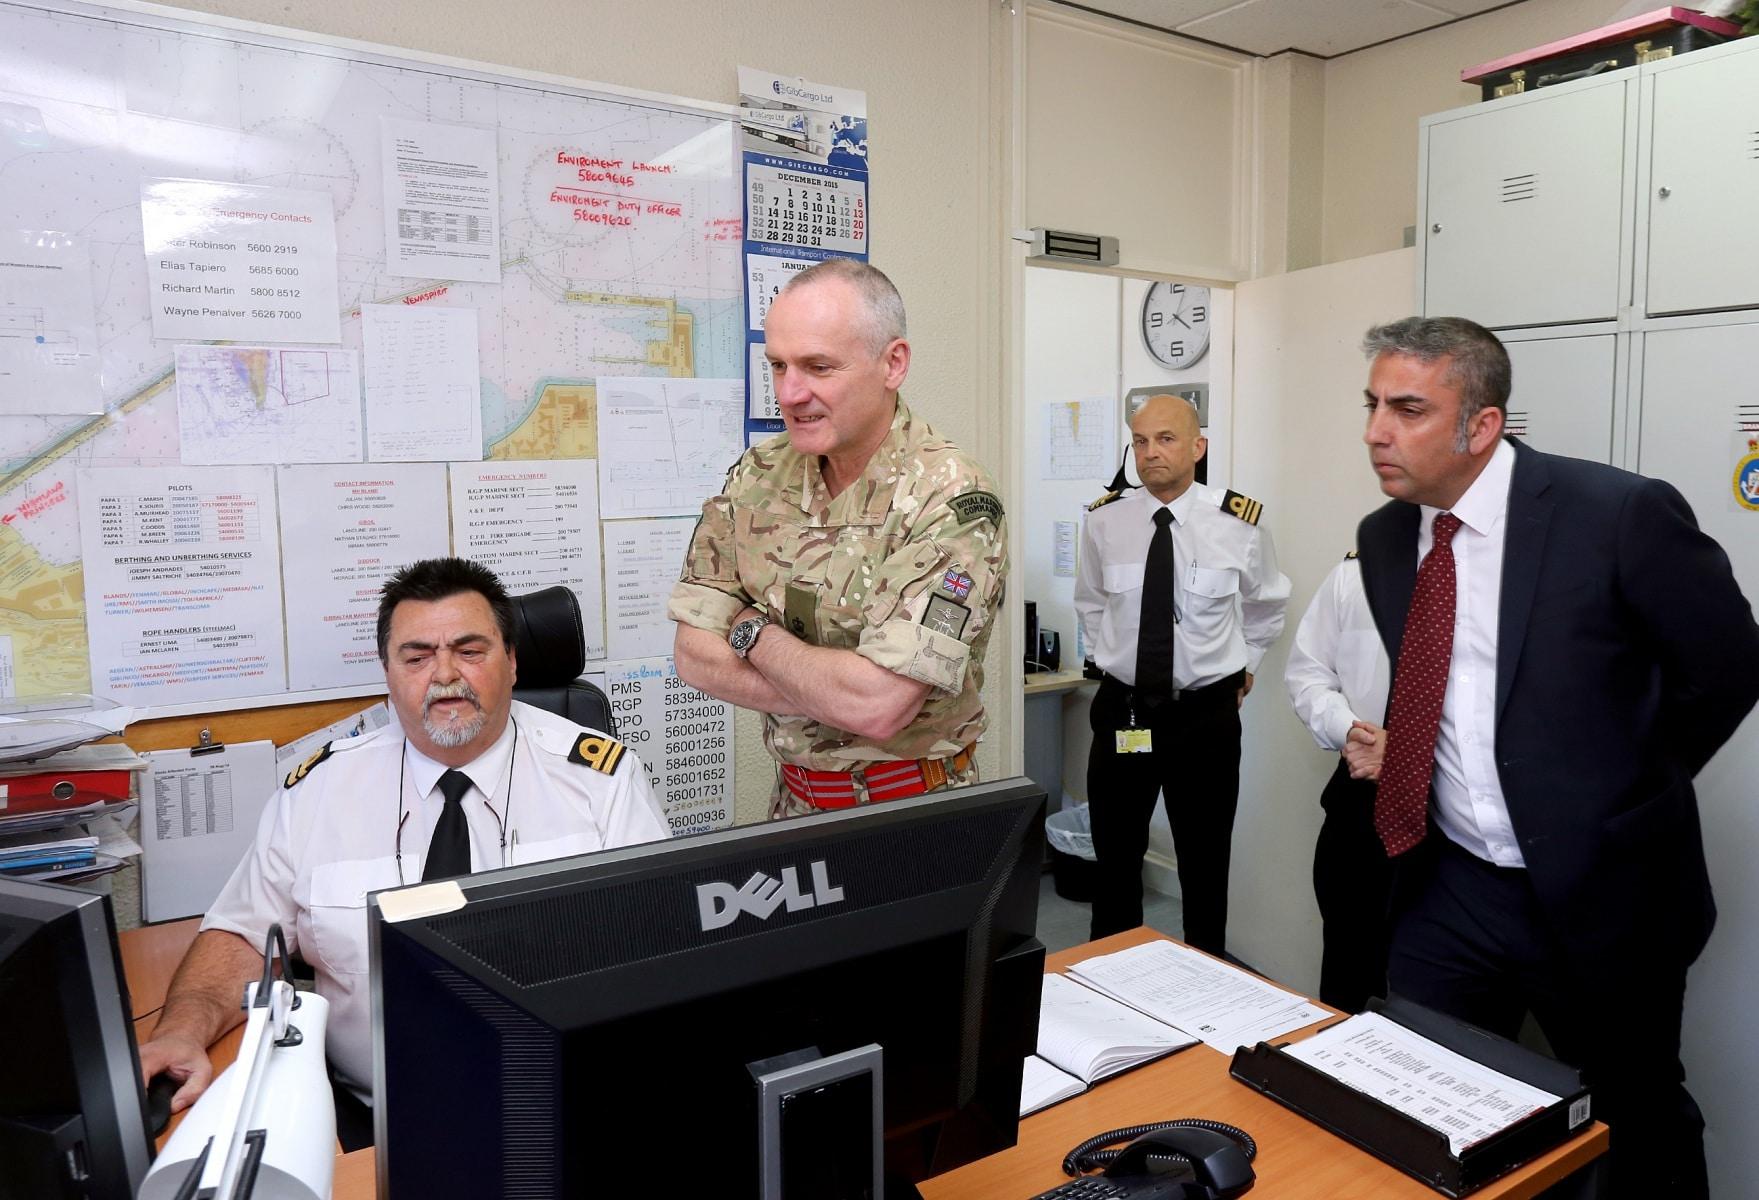 visita-oficial-del-gobernador-al-puerto-de-gibraltar_26128568356_o